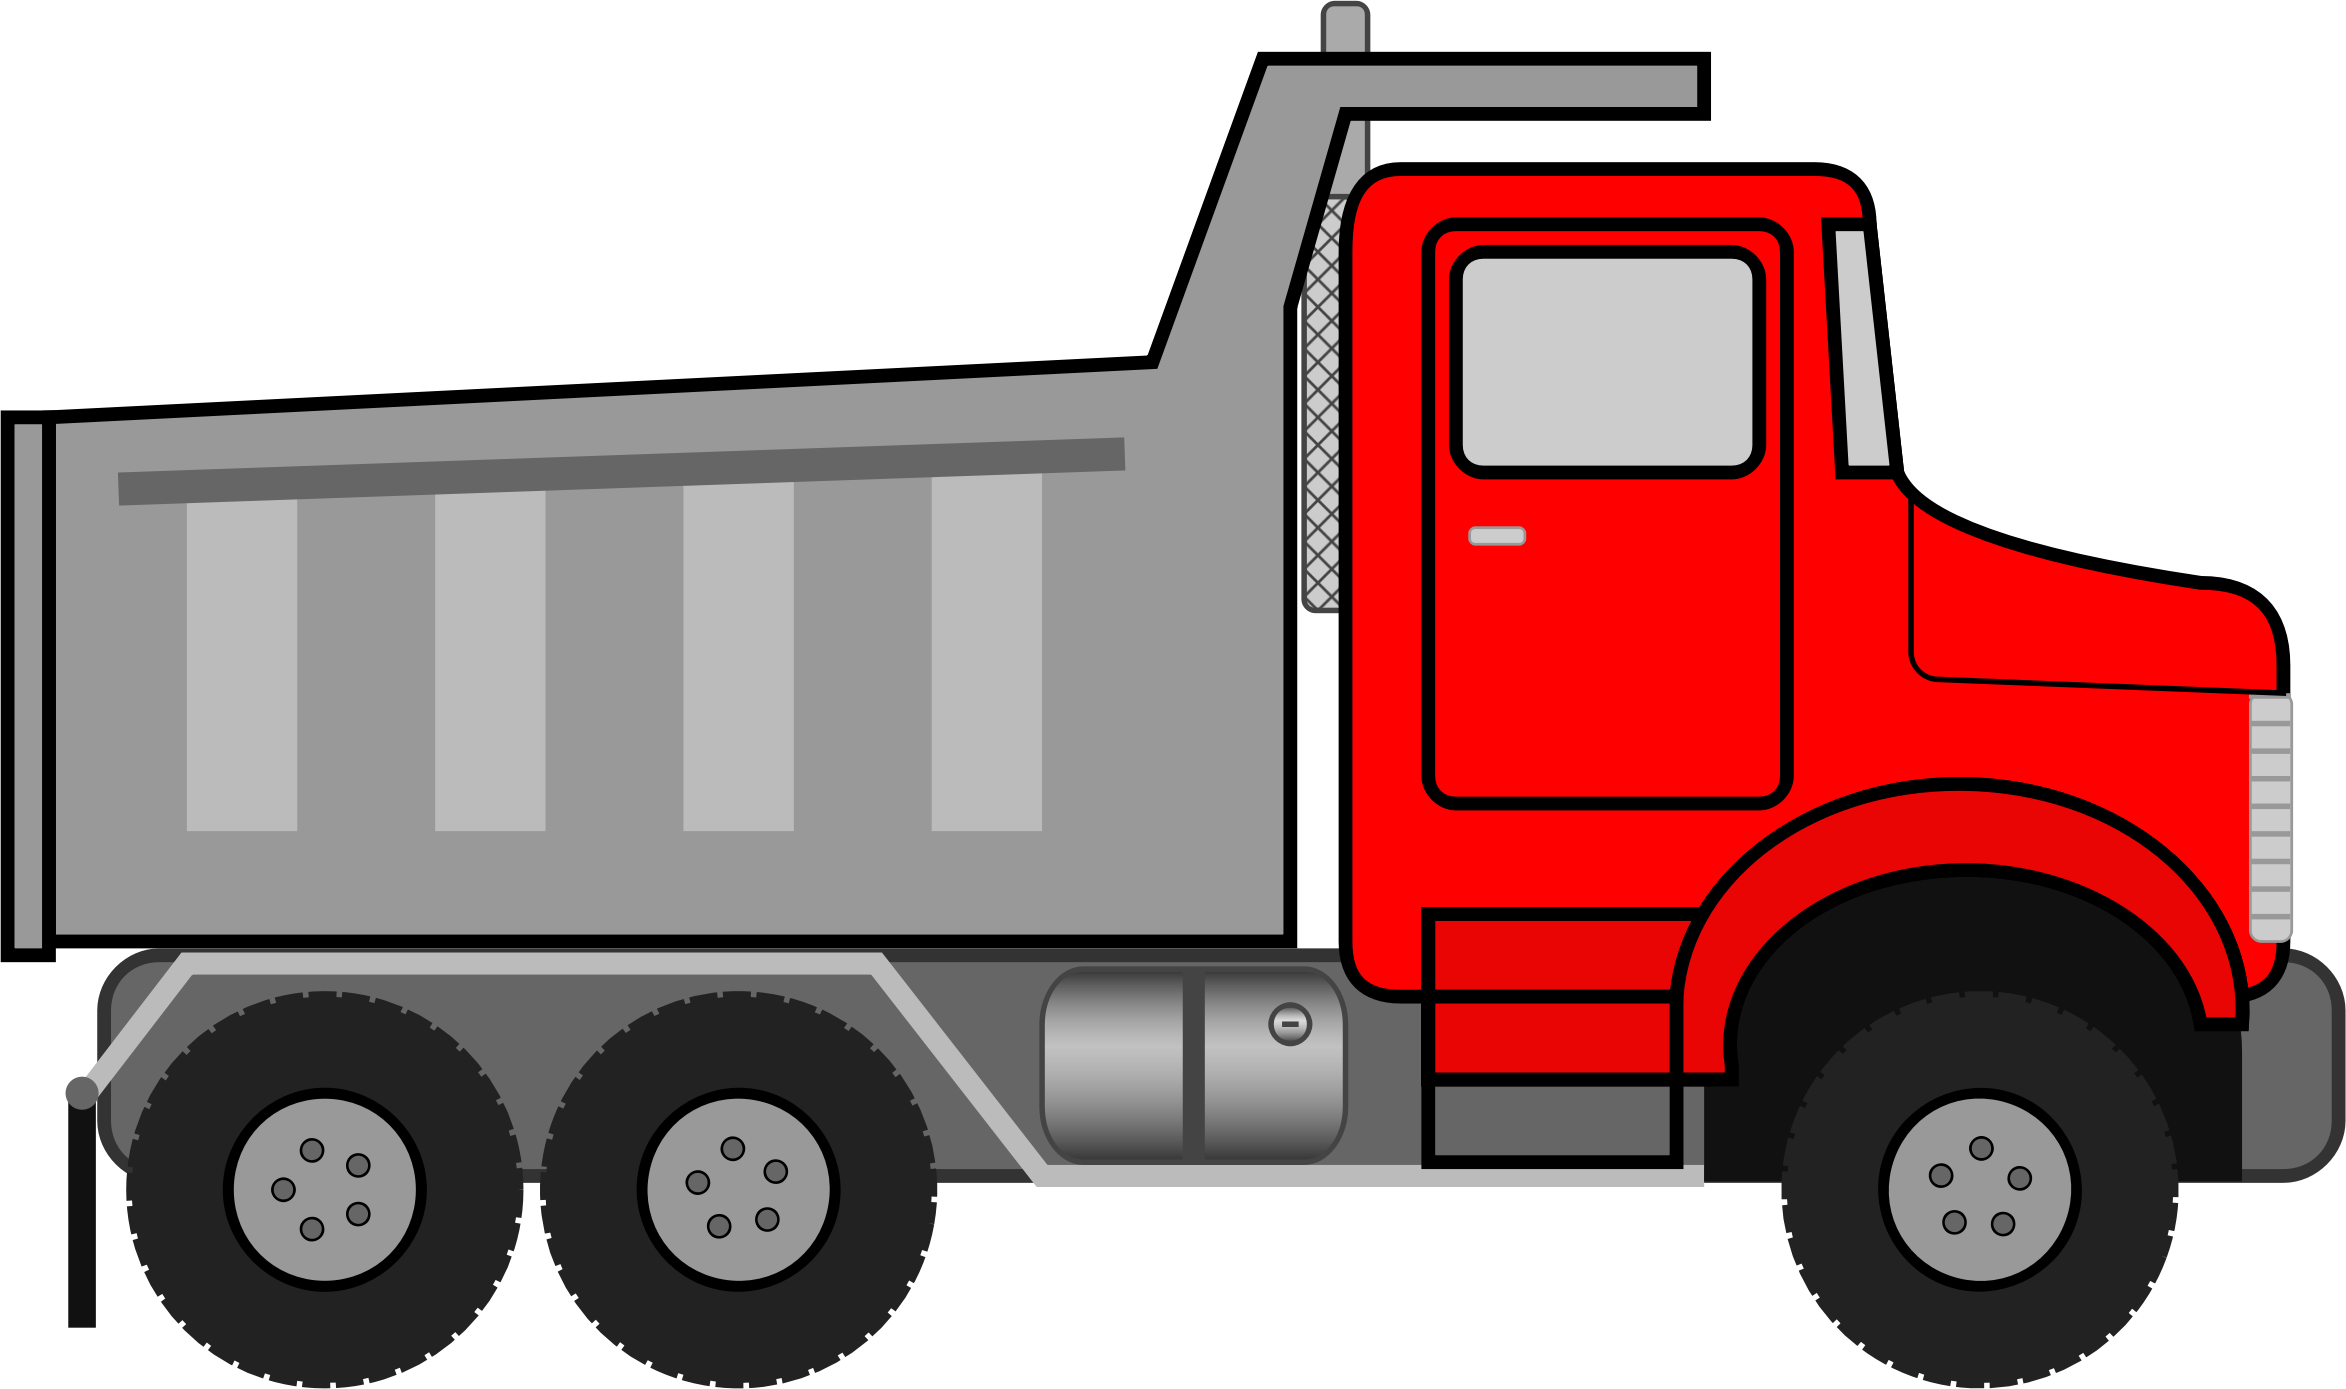 Garbage clipart bin lorry. Free photo truck load